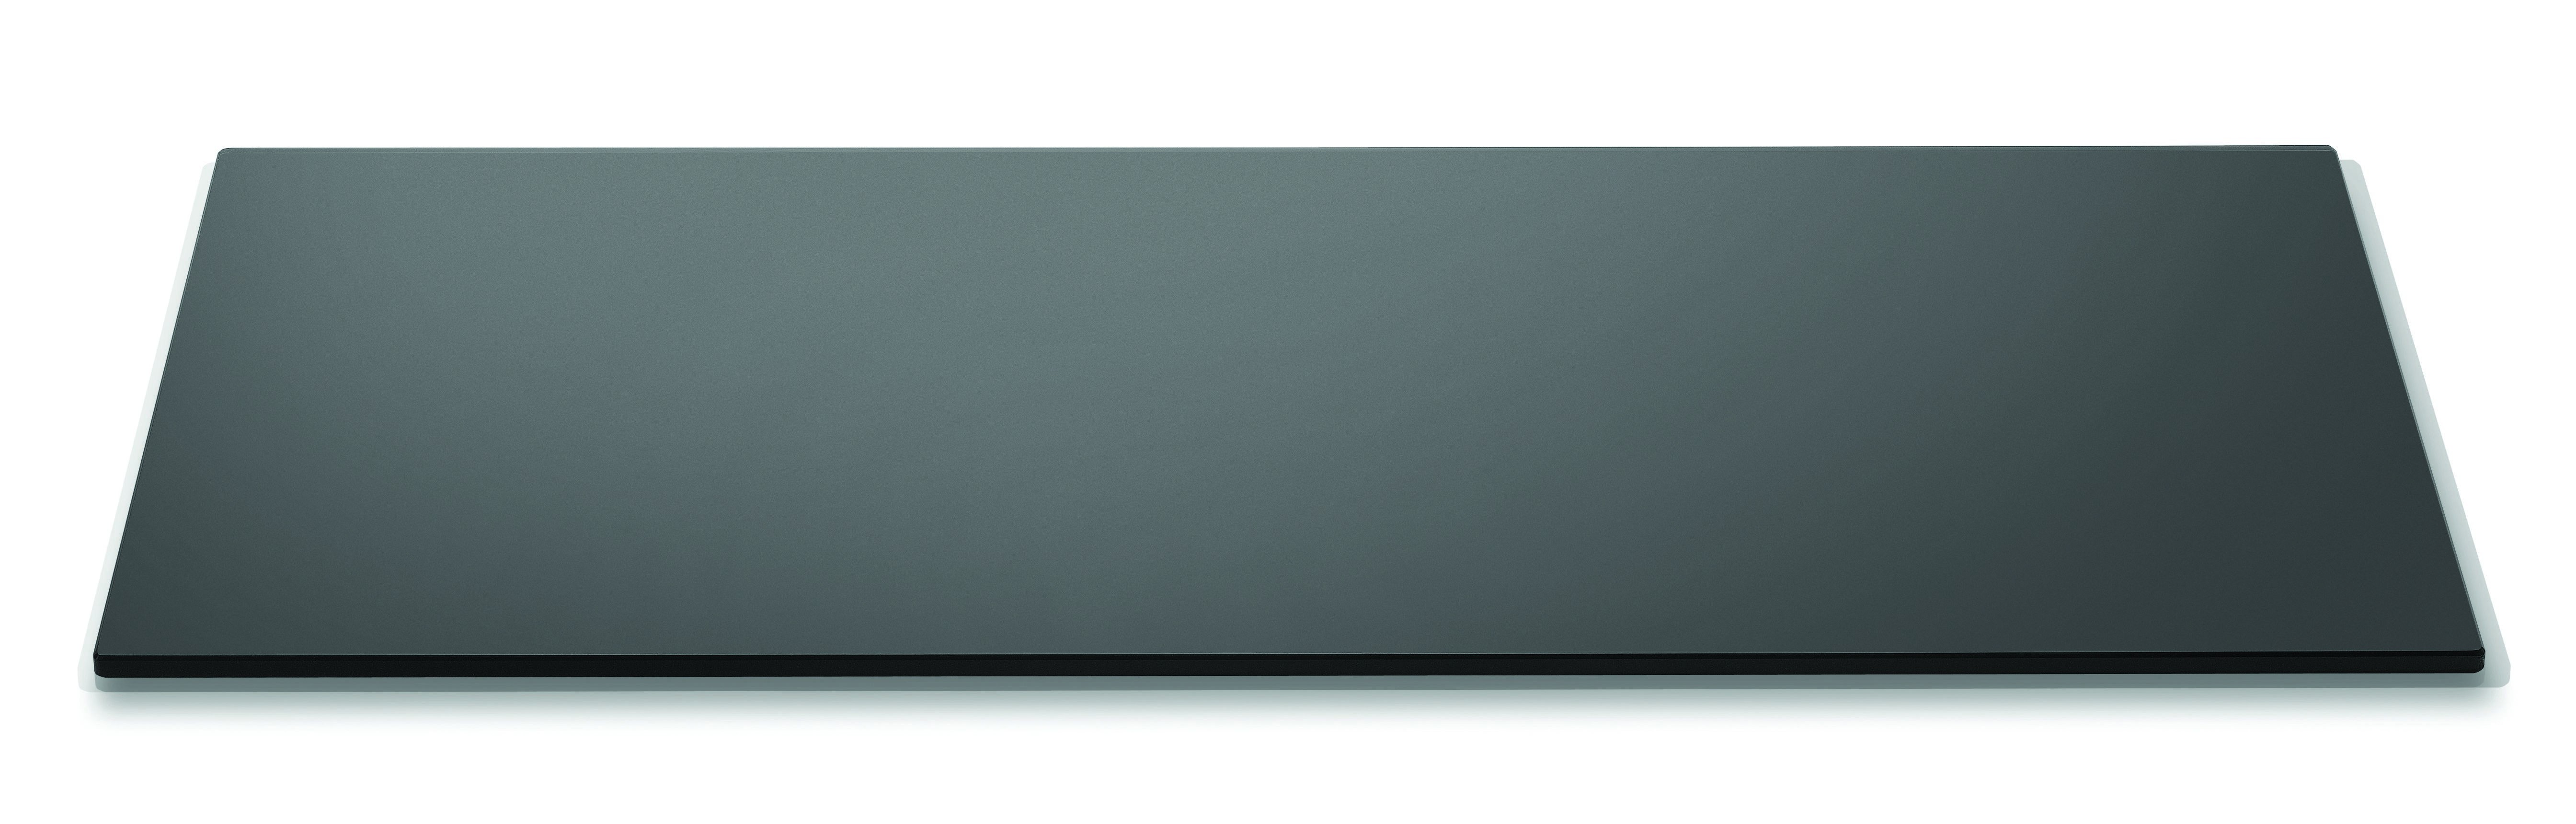 "Rosseto SG018 Wide Rectangular Black Acrylic Surface- 33.5"" x 14"""